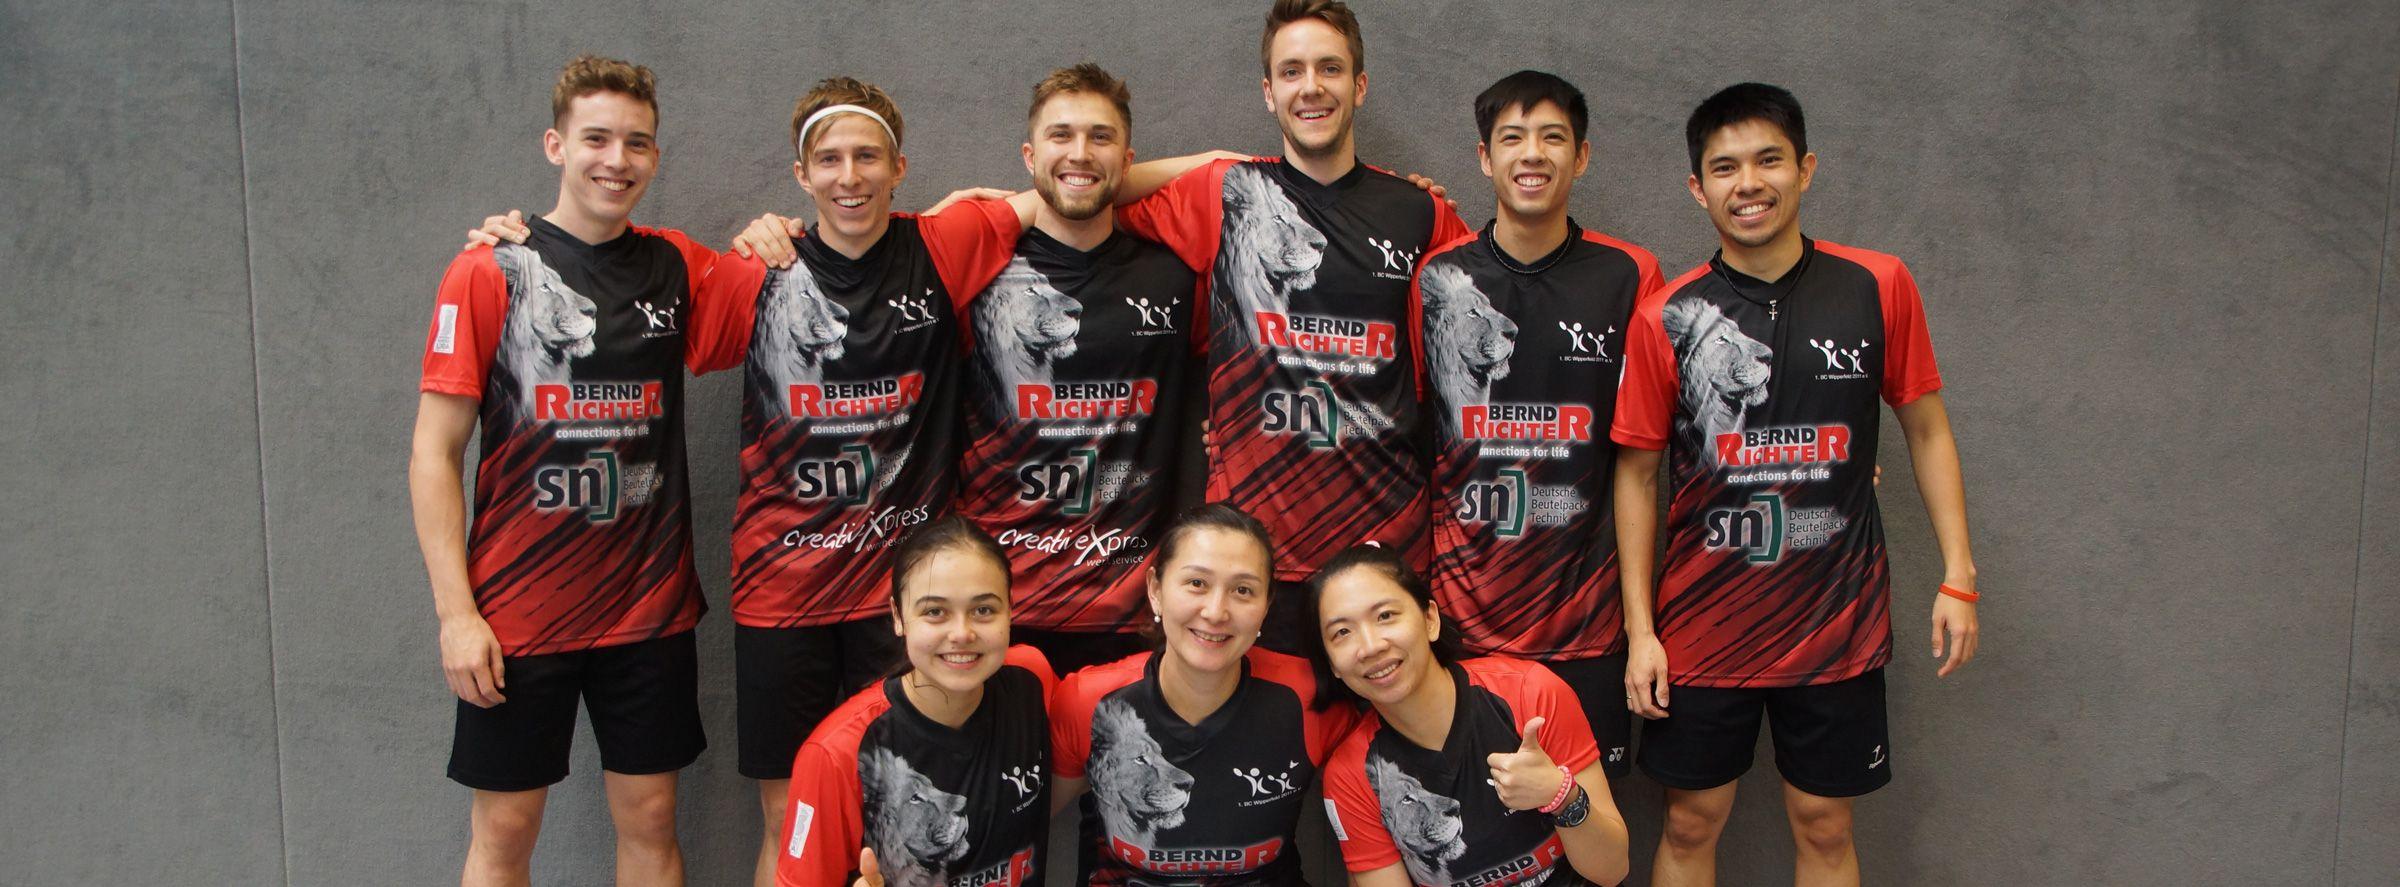 Badminton | 1. BC Wipperfeld 2011 e.V.